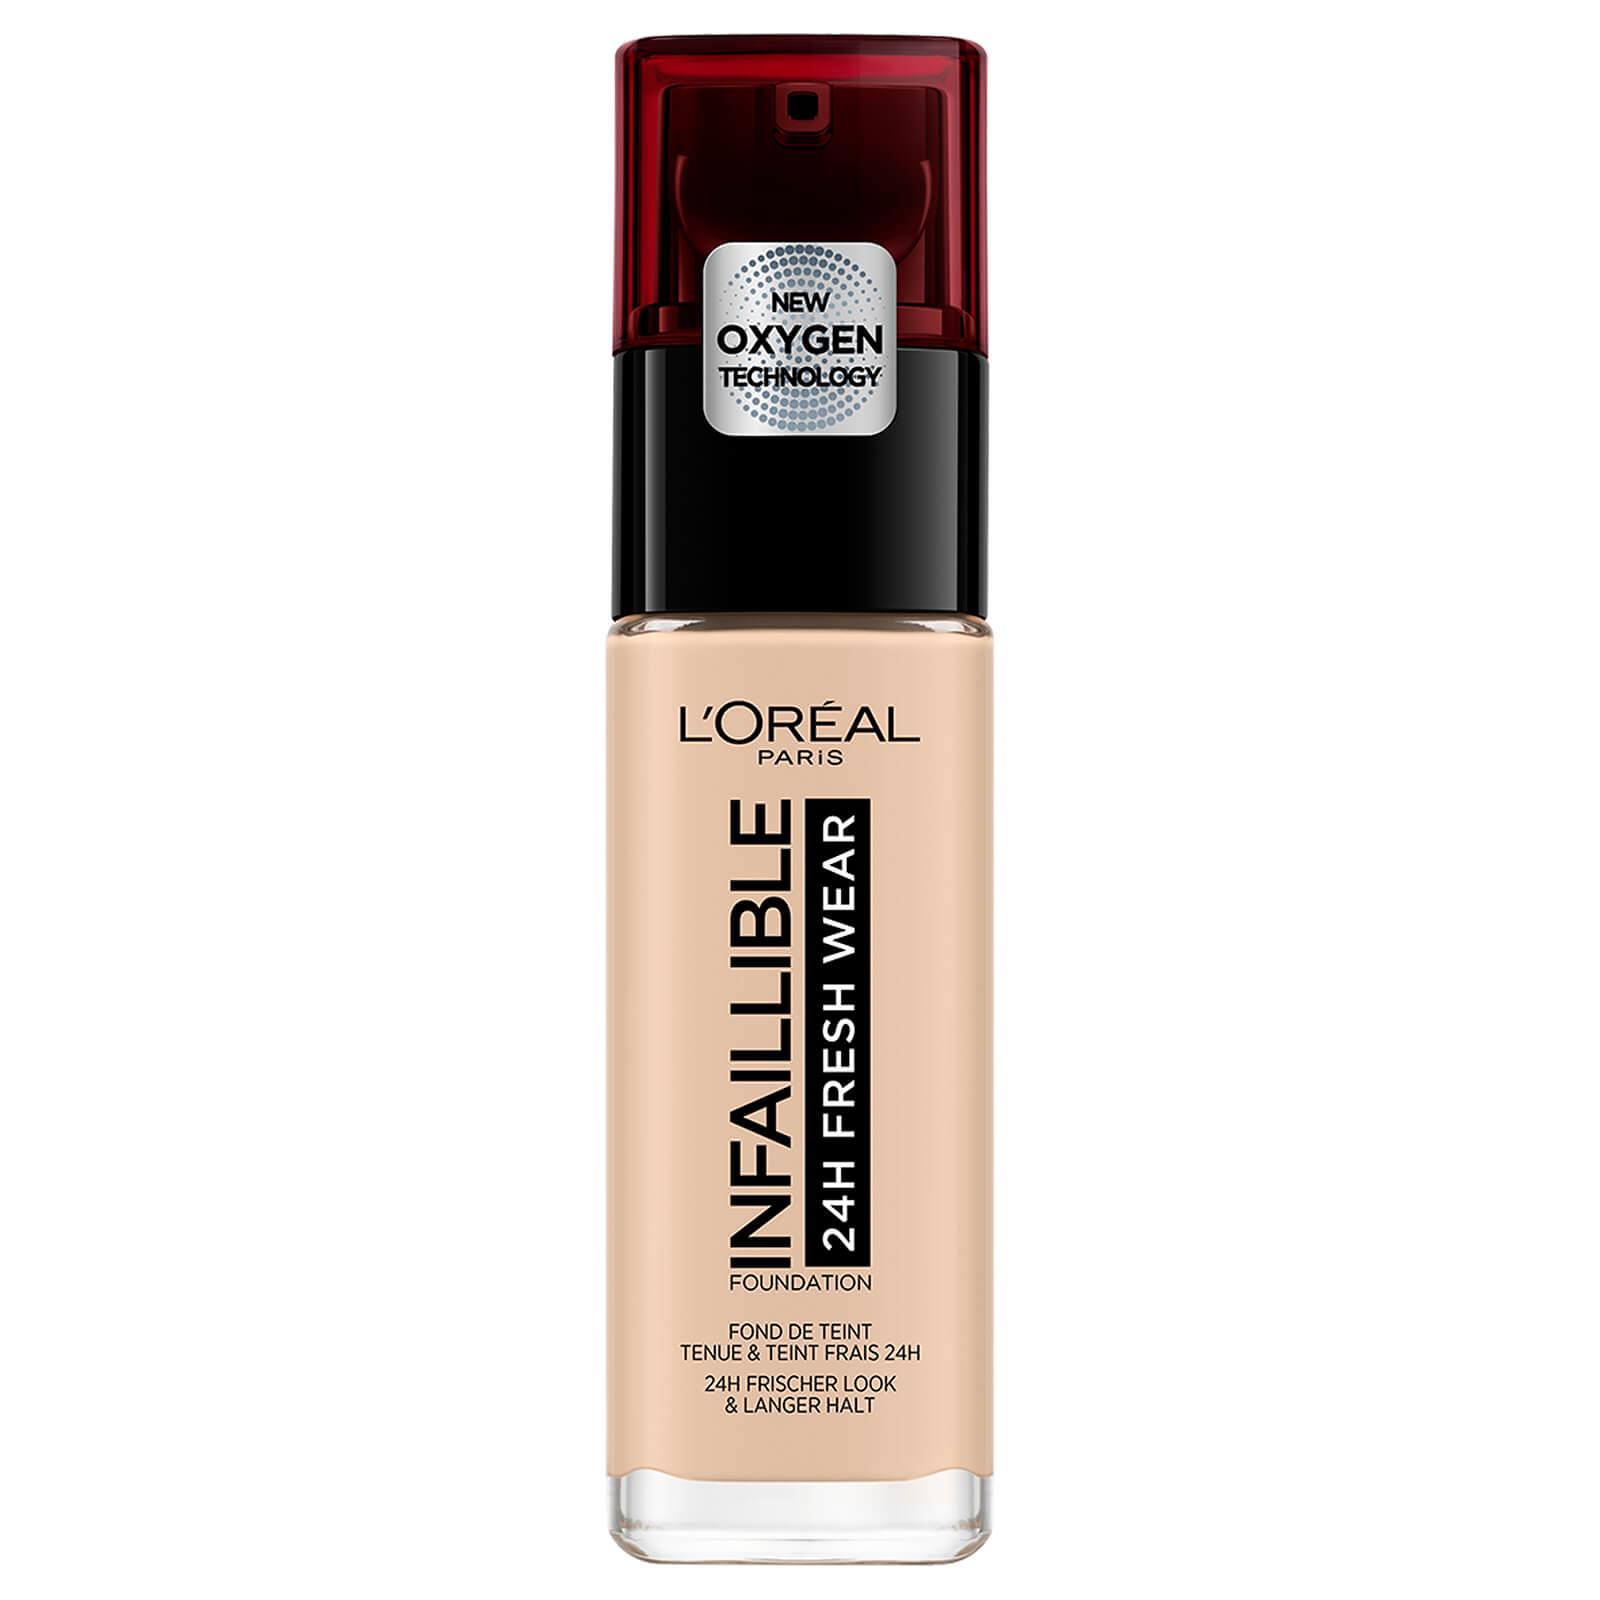 4716c4d0a91 L'Oréal Paris Infallible 24hr Freshwear Liquid Foundation (Various Shades)  | Free Shipping | Lookfantastic